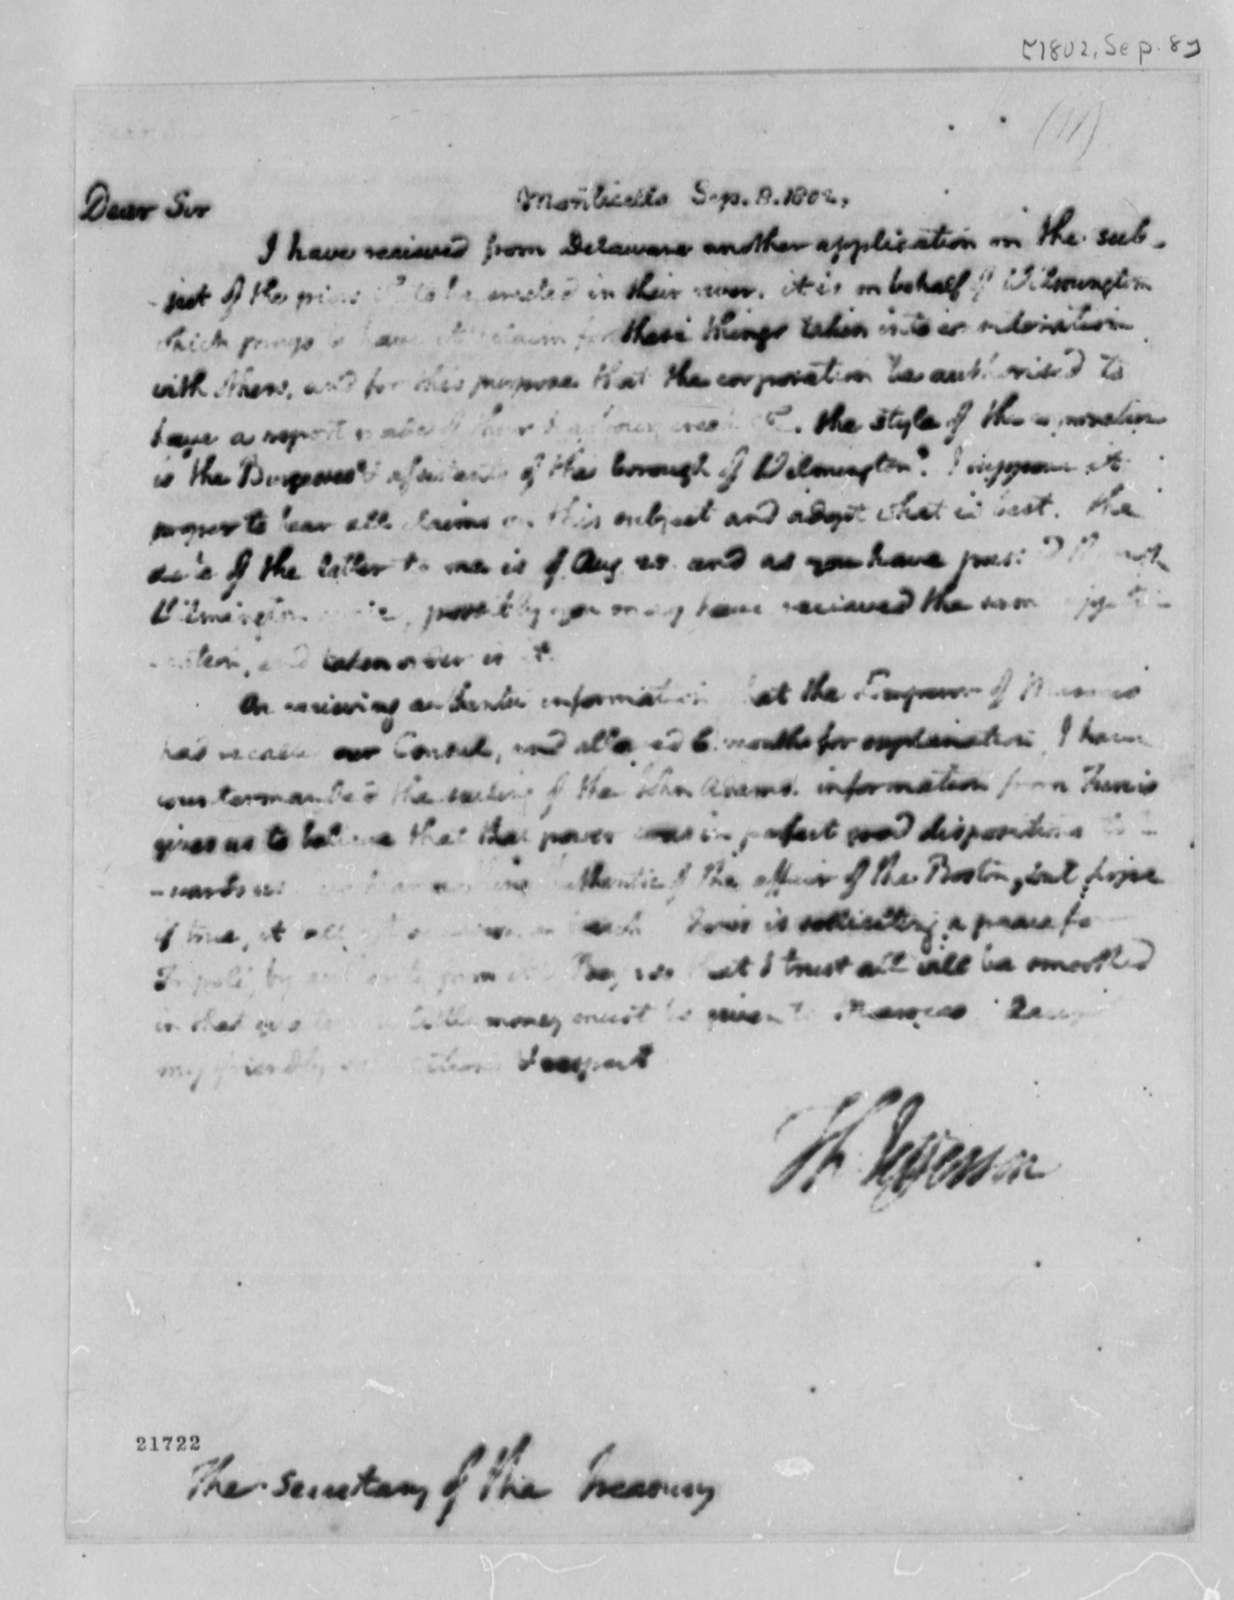 Thomas Jefferson to Albert Gallatin, September 8, 1802